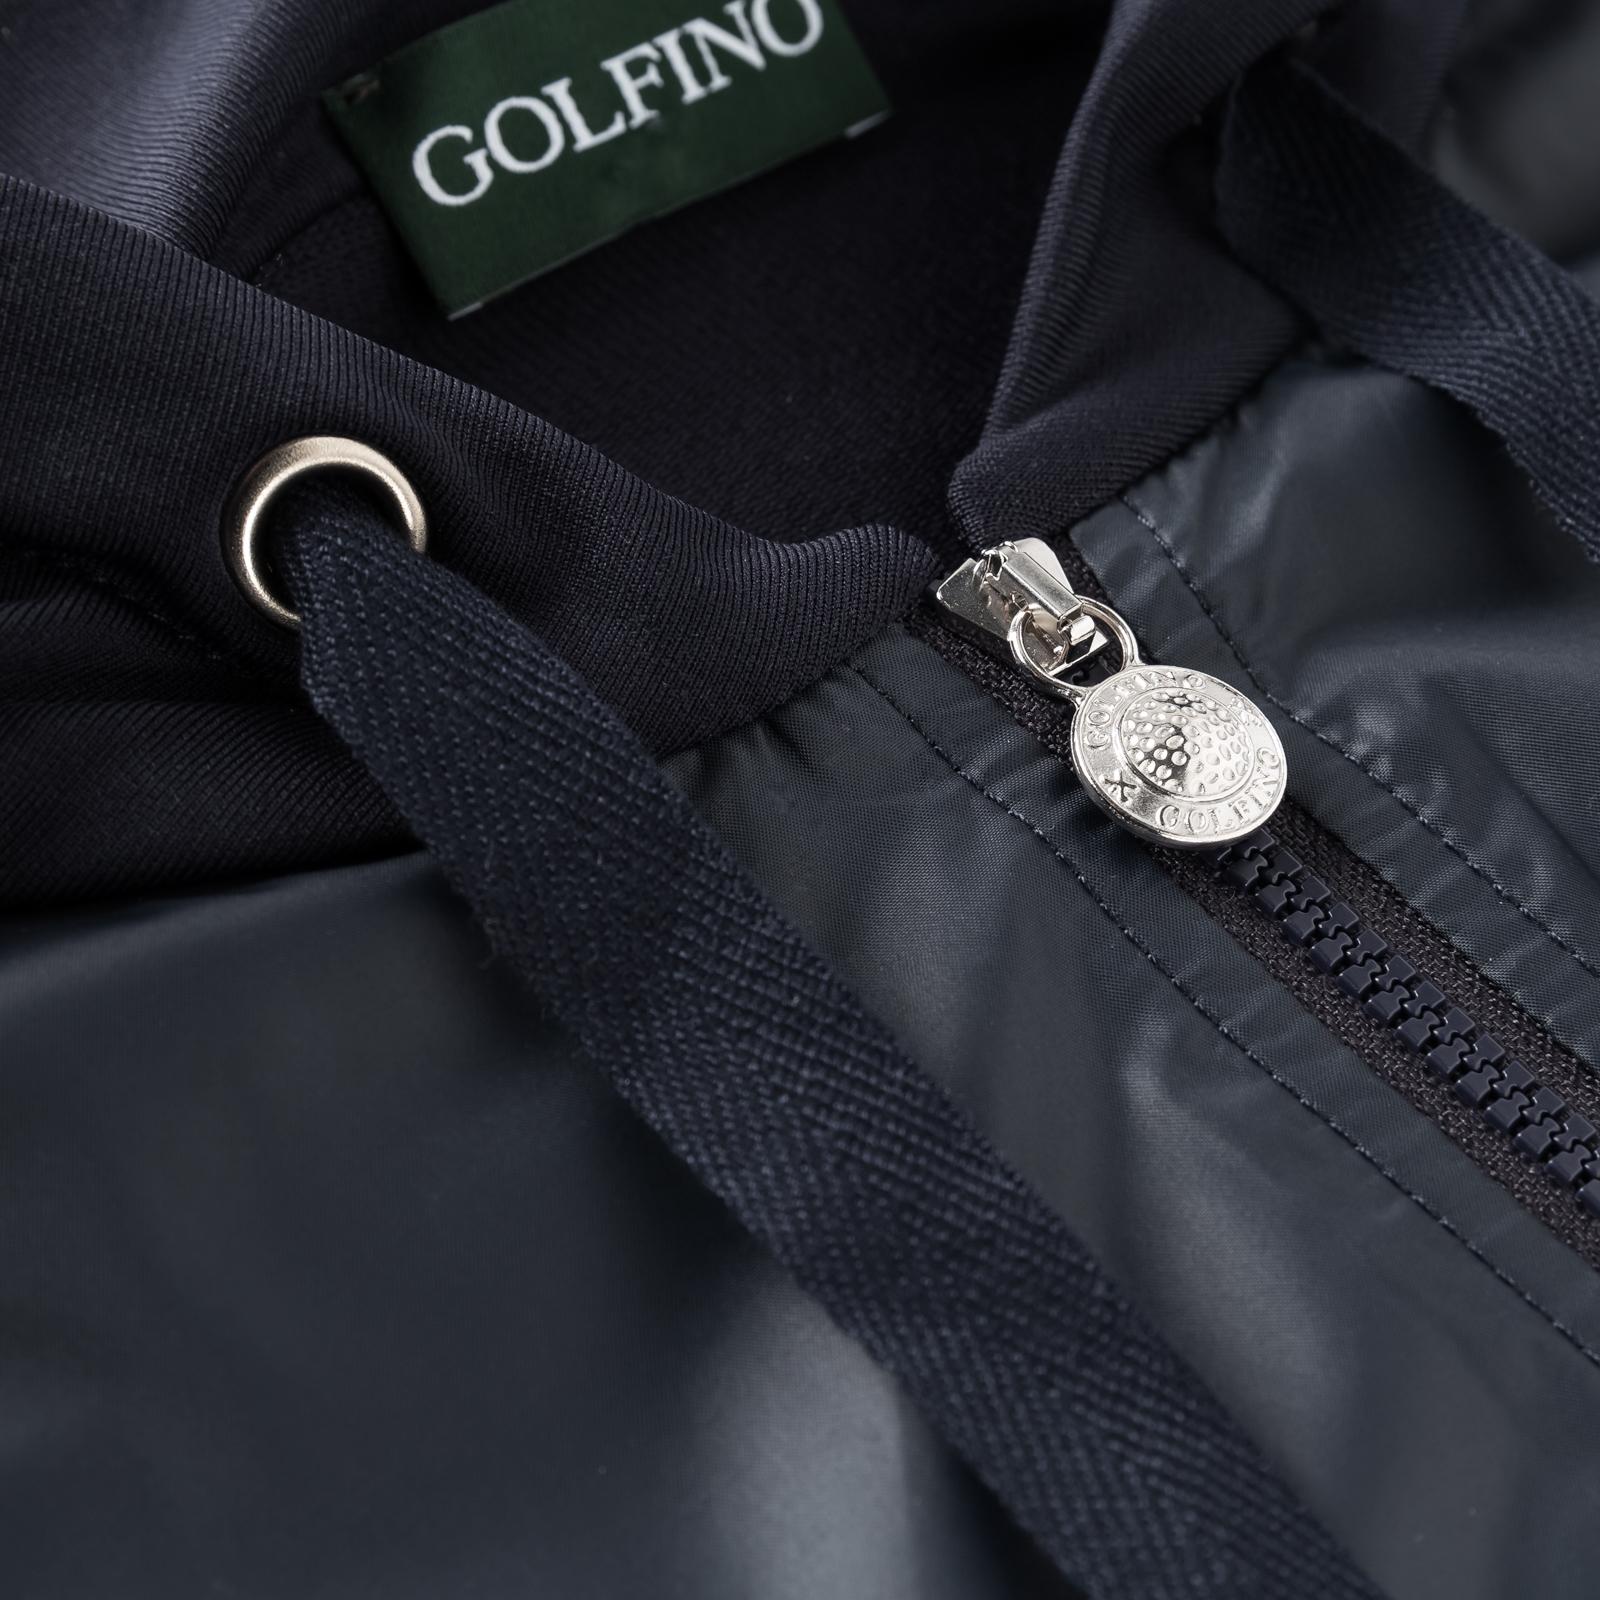 Damen Golfjacke mit Extra Stretch Komfort in Regular Fit